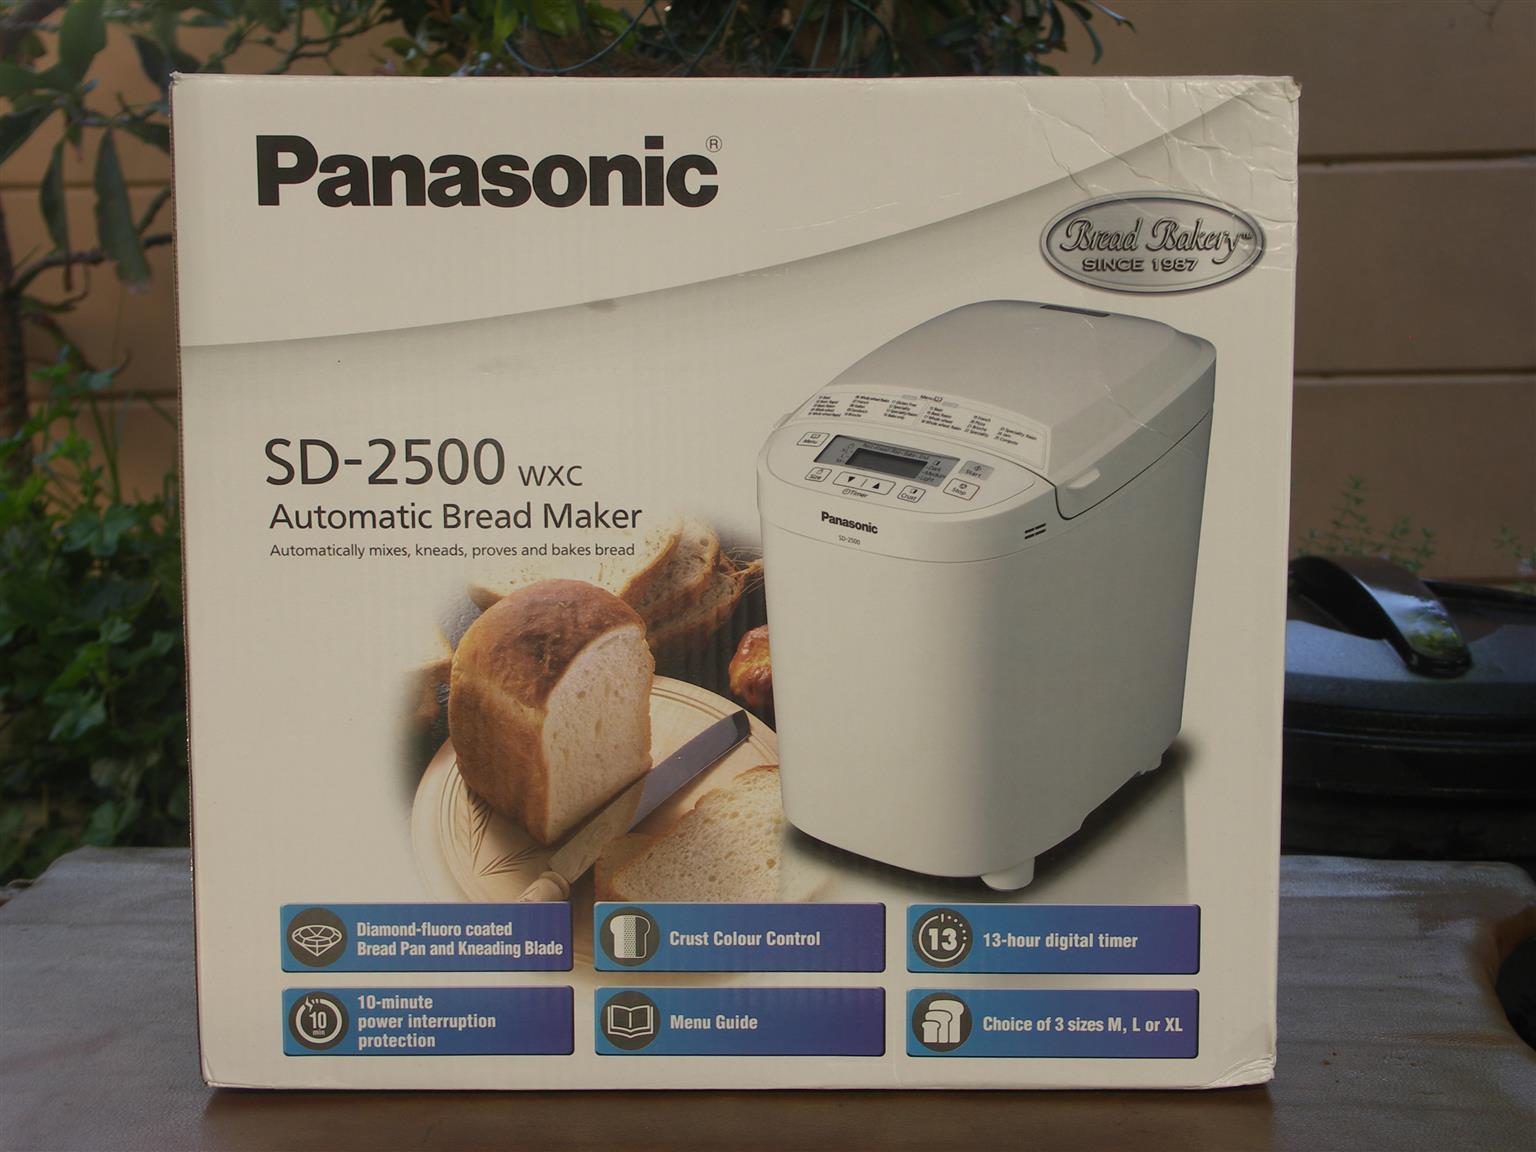 PANASONIC AUTOMATIC BREAD MAKER : MODEL NO. SD-2500